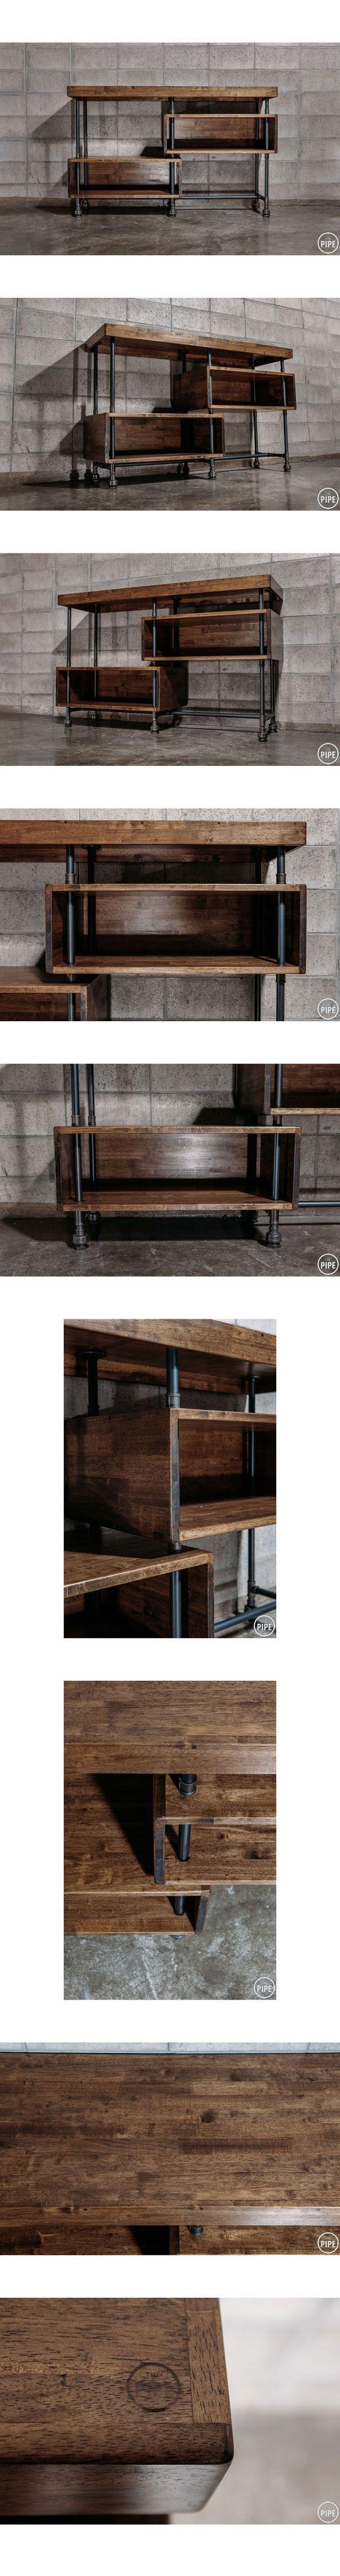 The pipe u metal pipe furniture u wall units in u